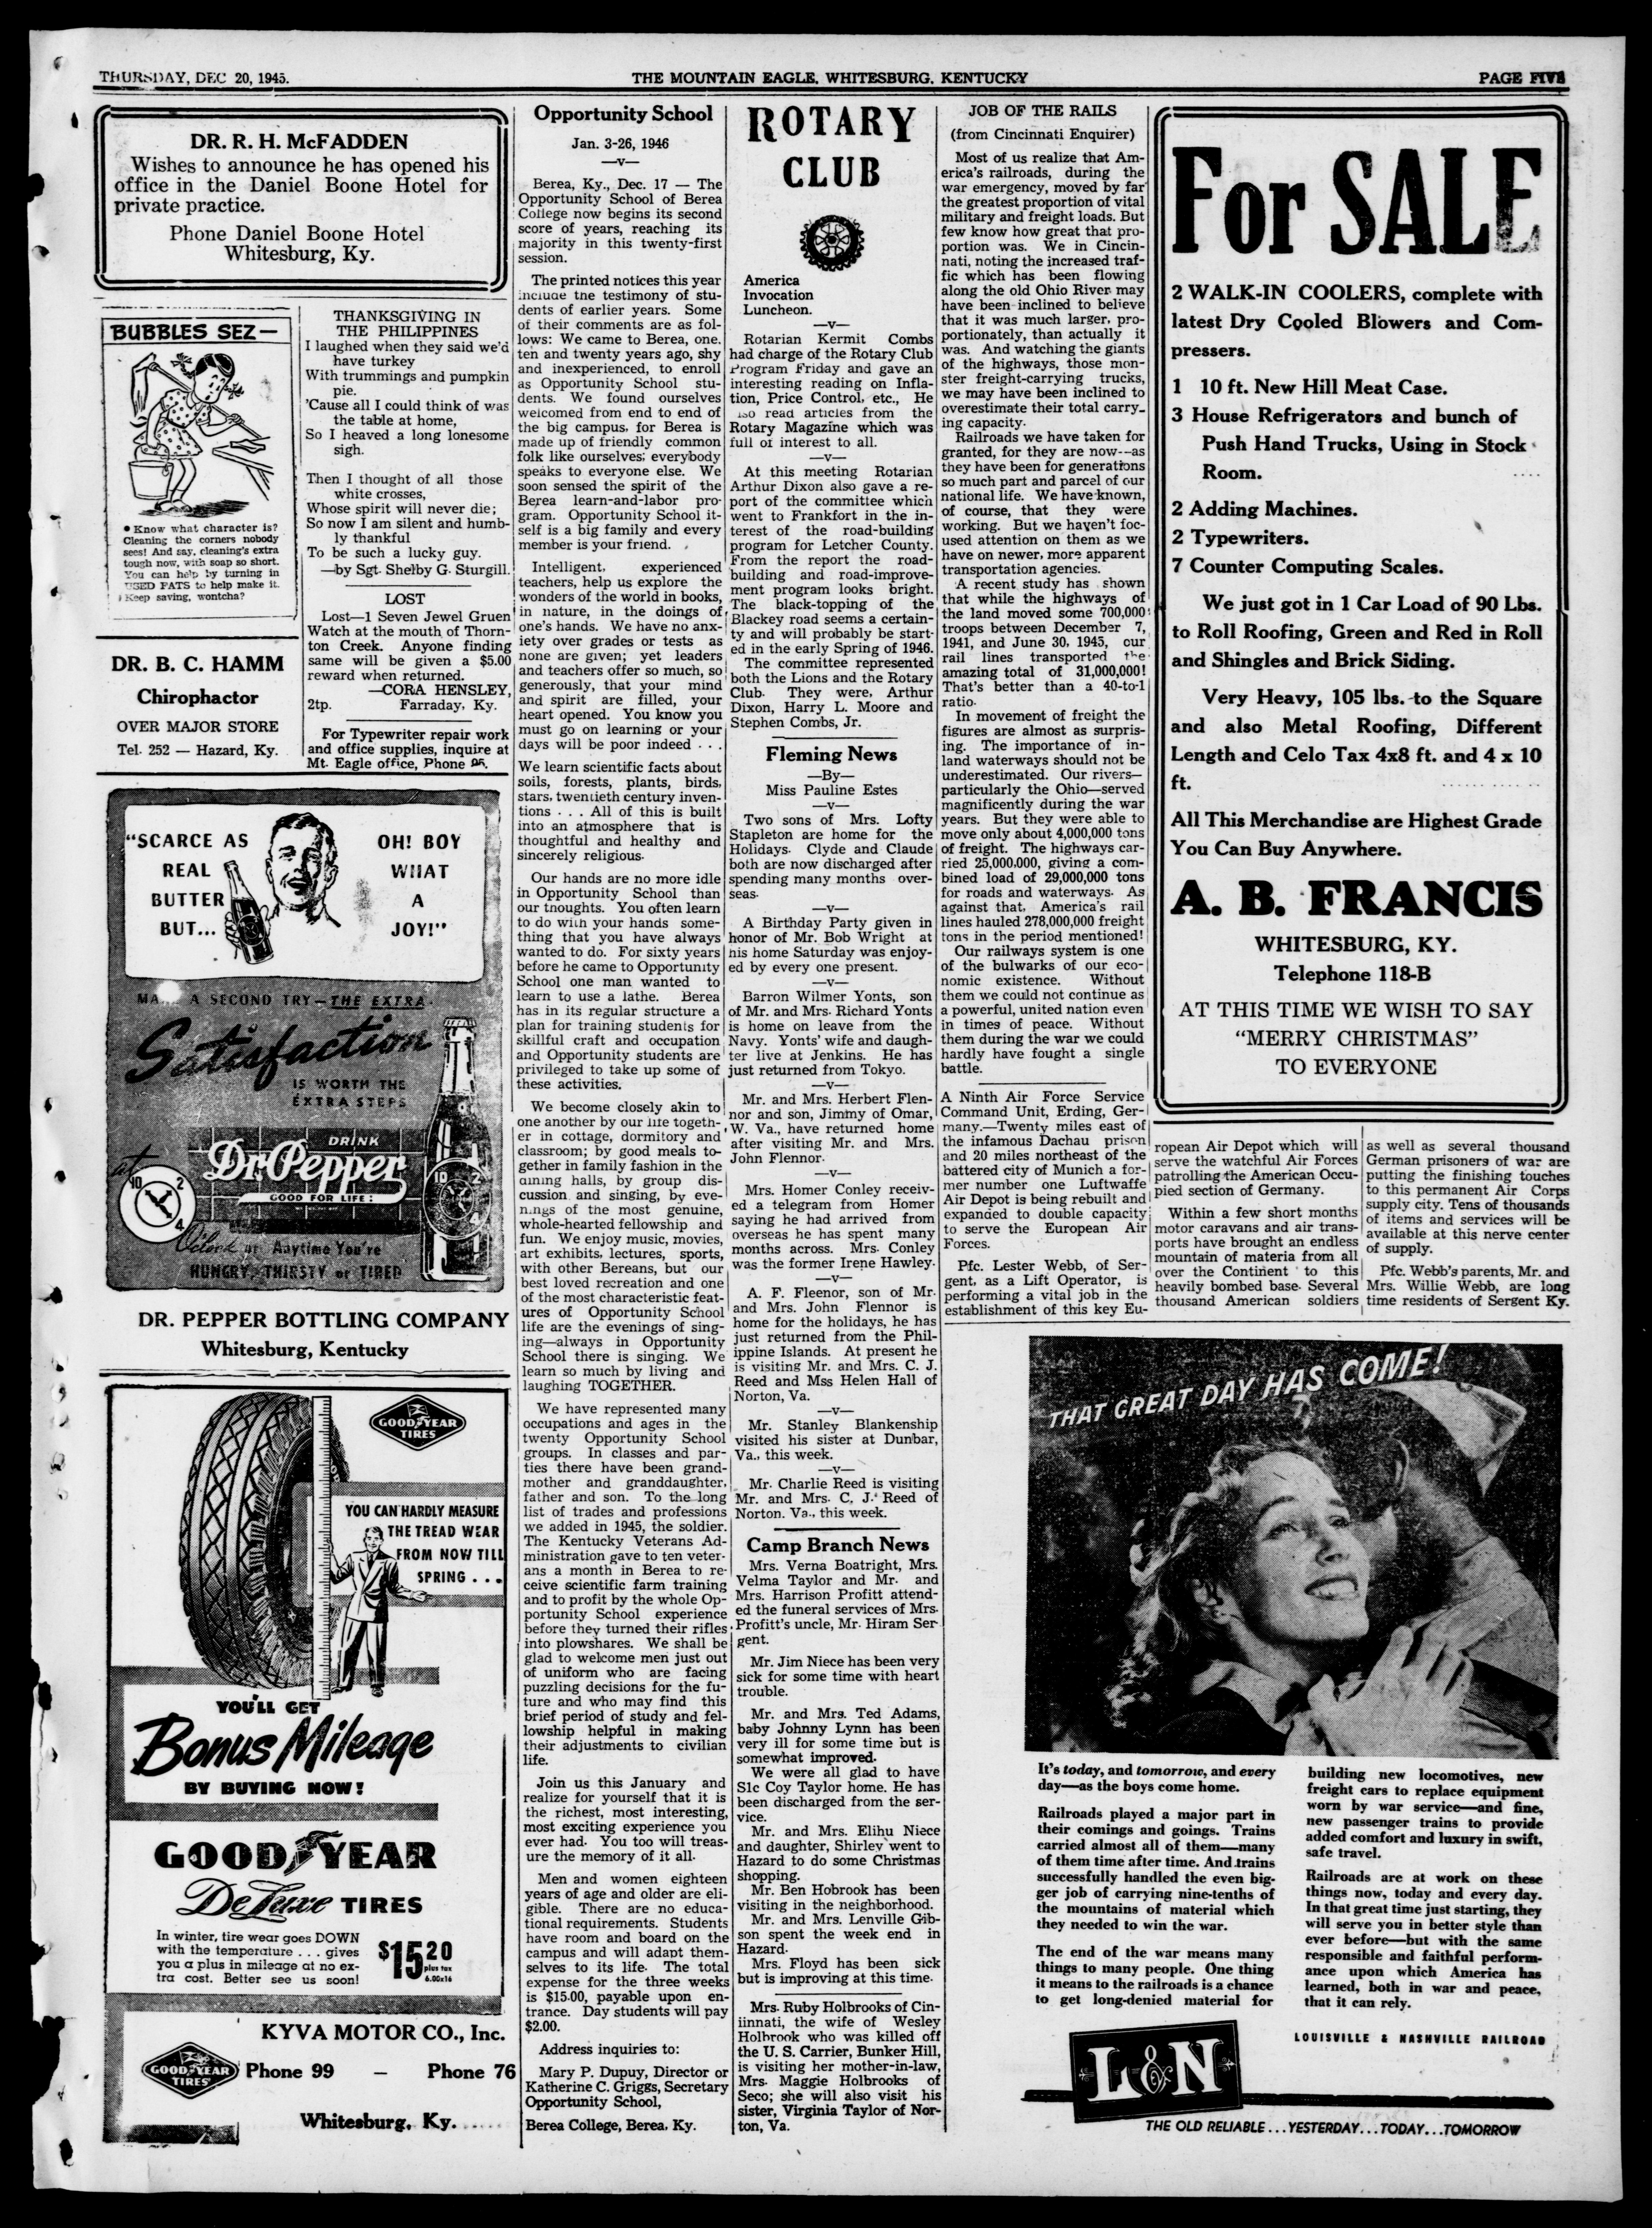 Image 5 of Mountain eagle (Whitesburg, Ky ), December 20, 1945